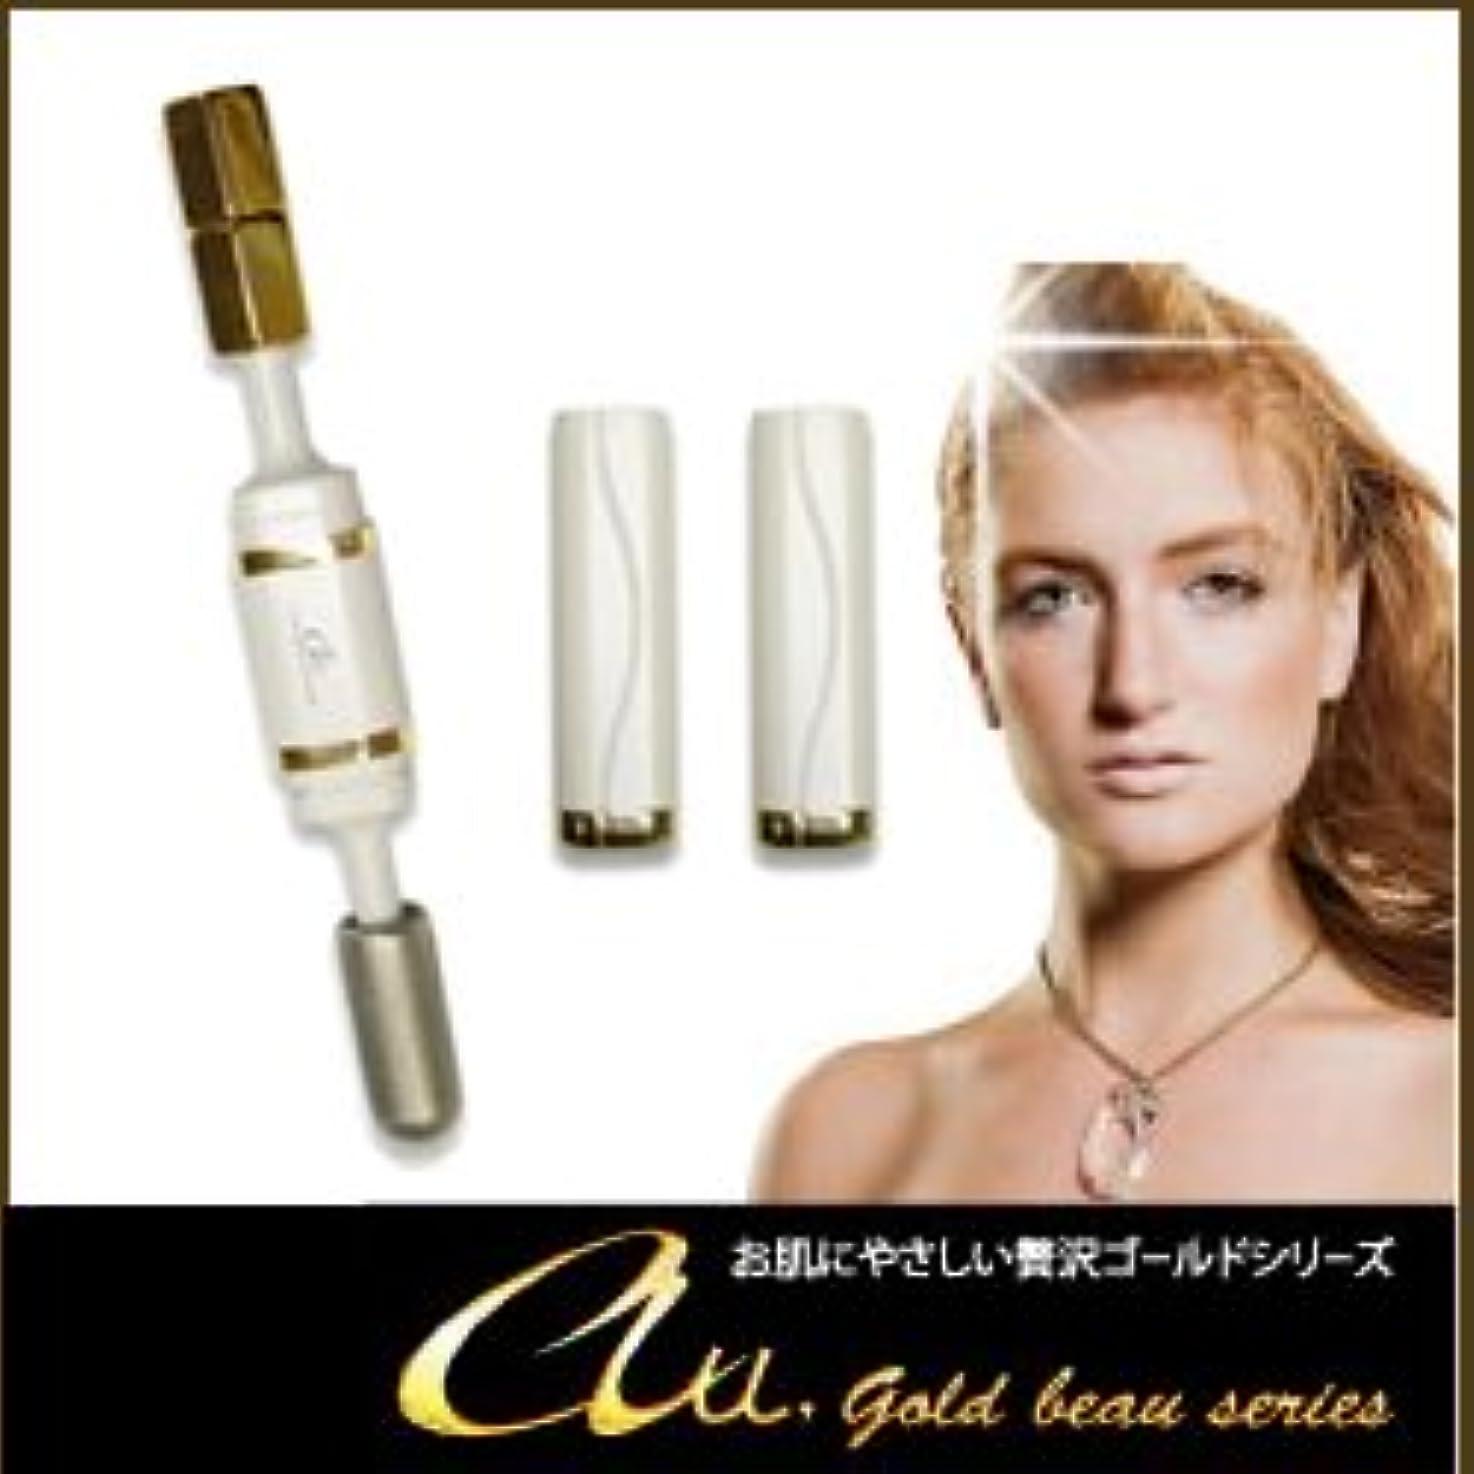 【GOLDBEAUROLLER】 ゴールドビューローラー【20KGOLD使用】コロコロ美容ローラー